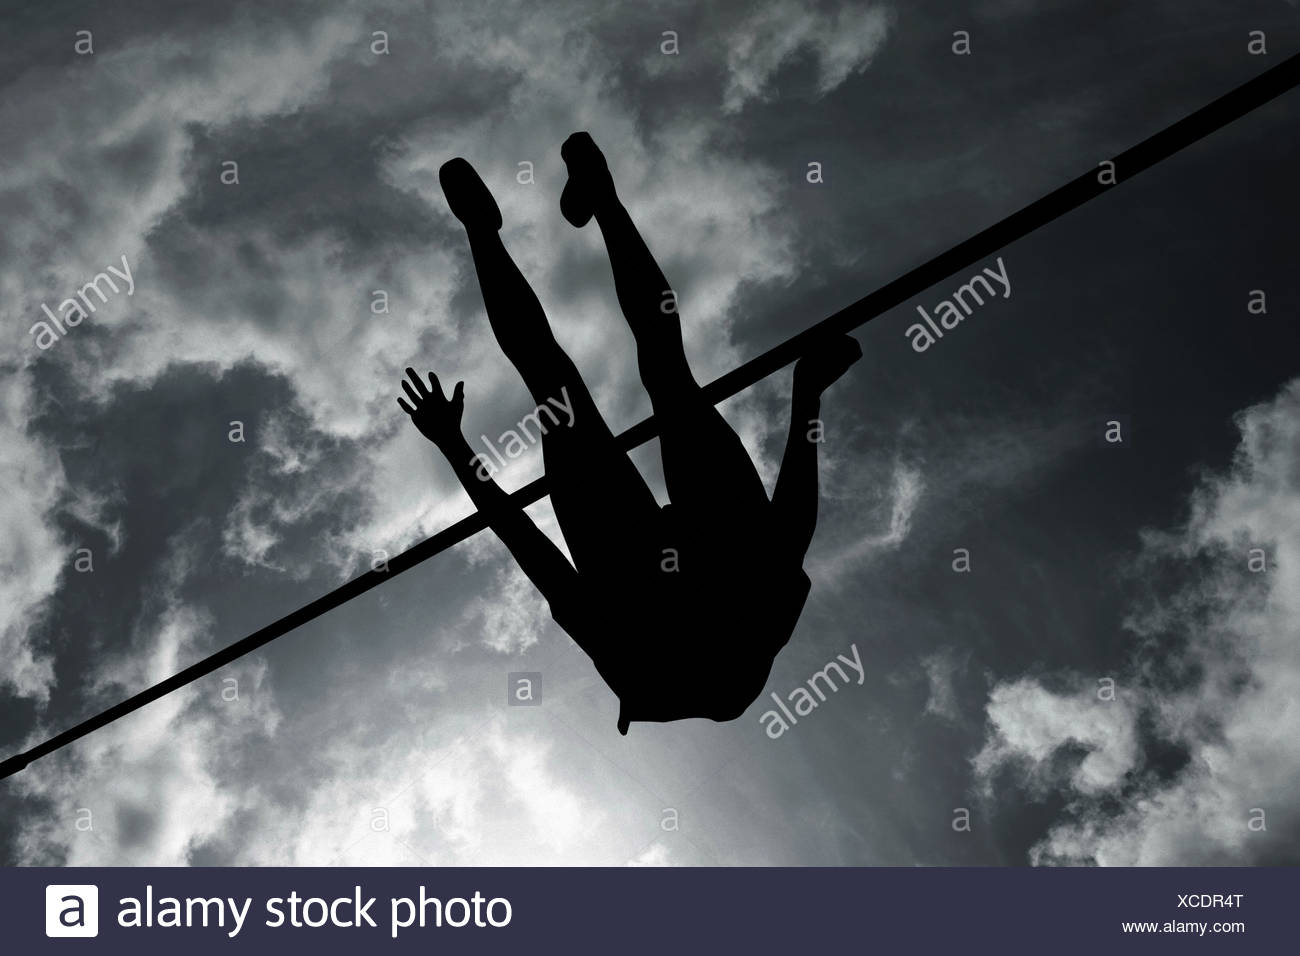 Silueta de puente alto Imagen De Stock